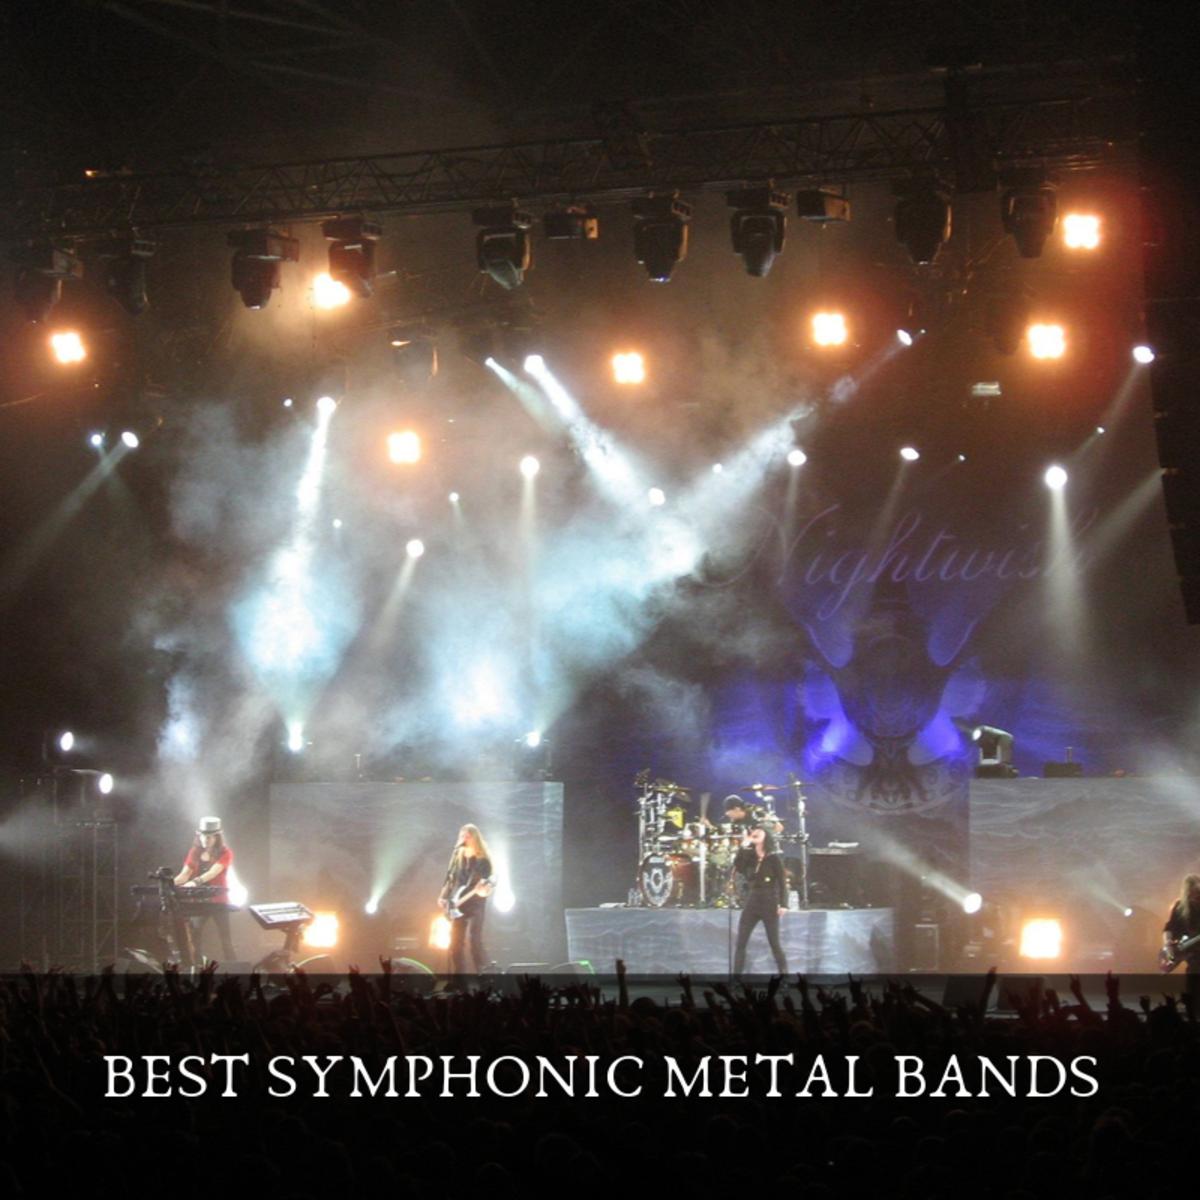 100 Best Symphonic Metal Bands